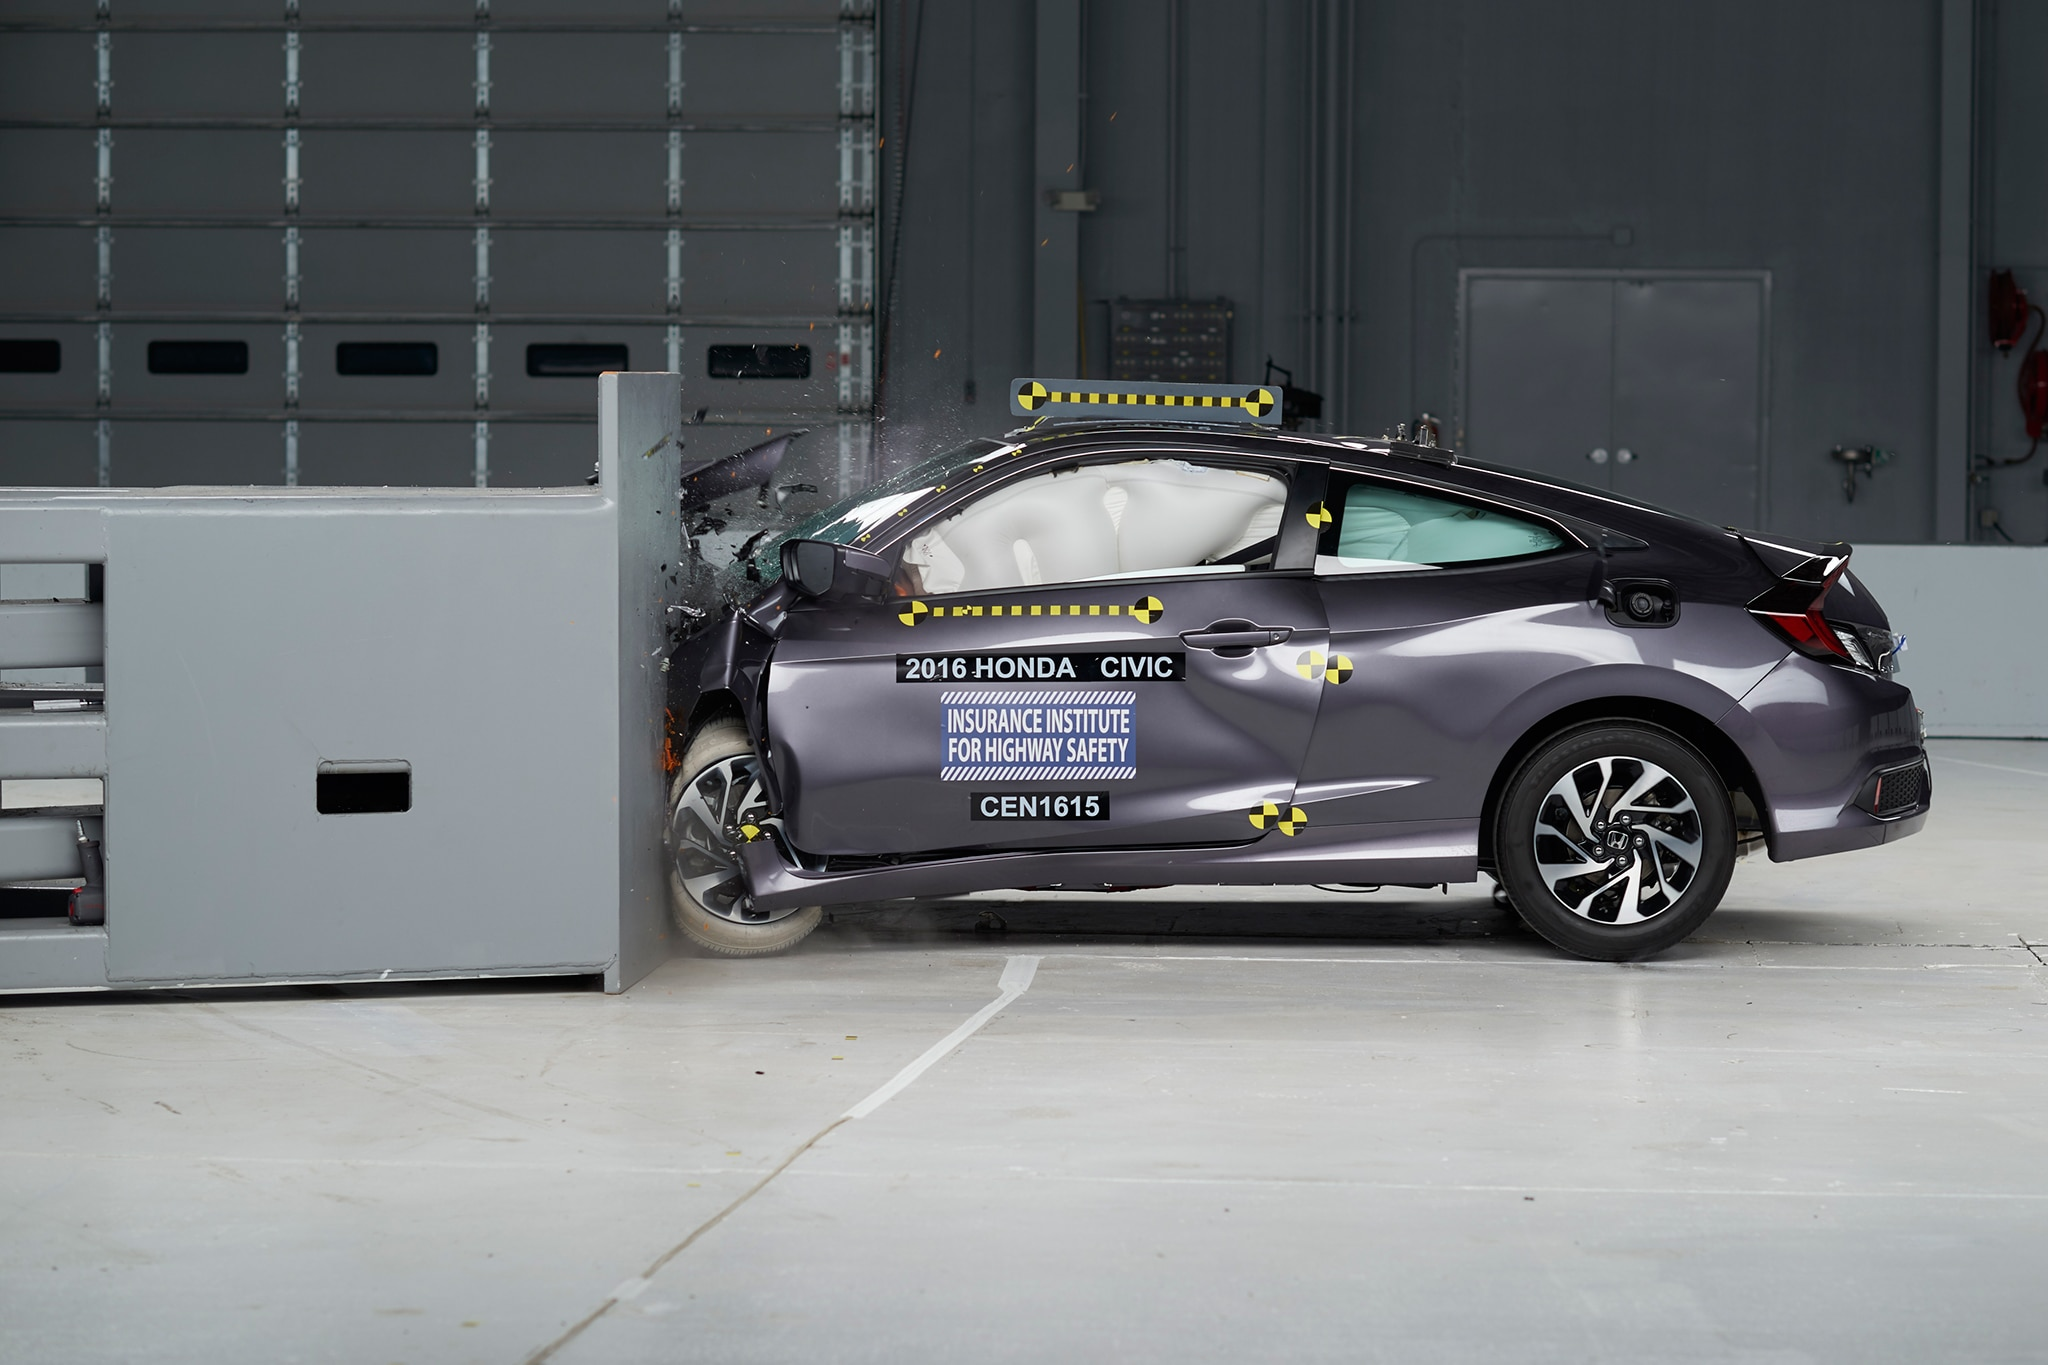 2016 Honda Civic Coupe IIHS testing side profile crash